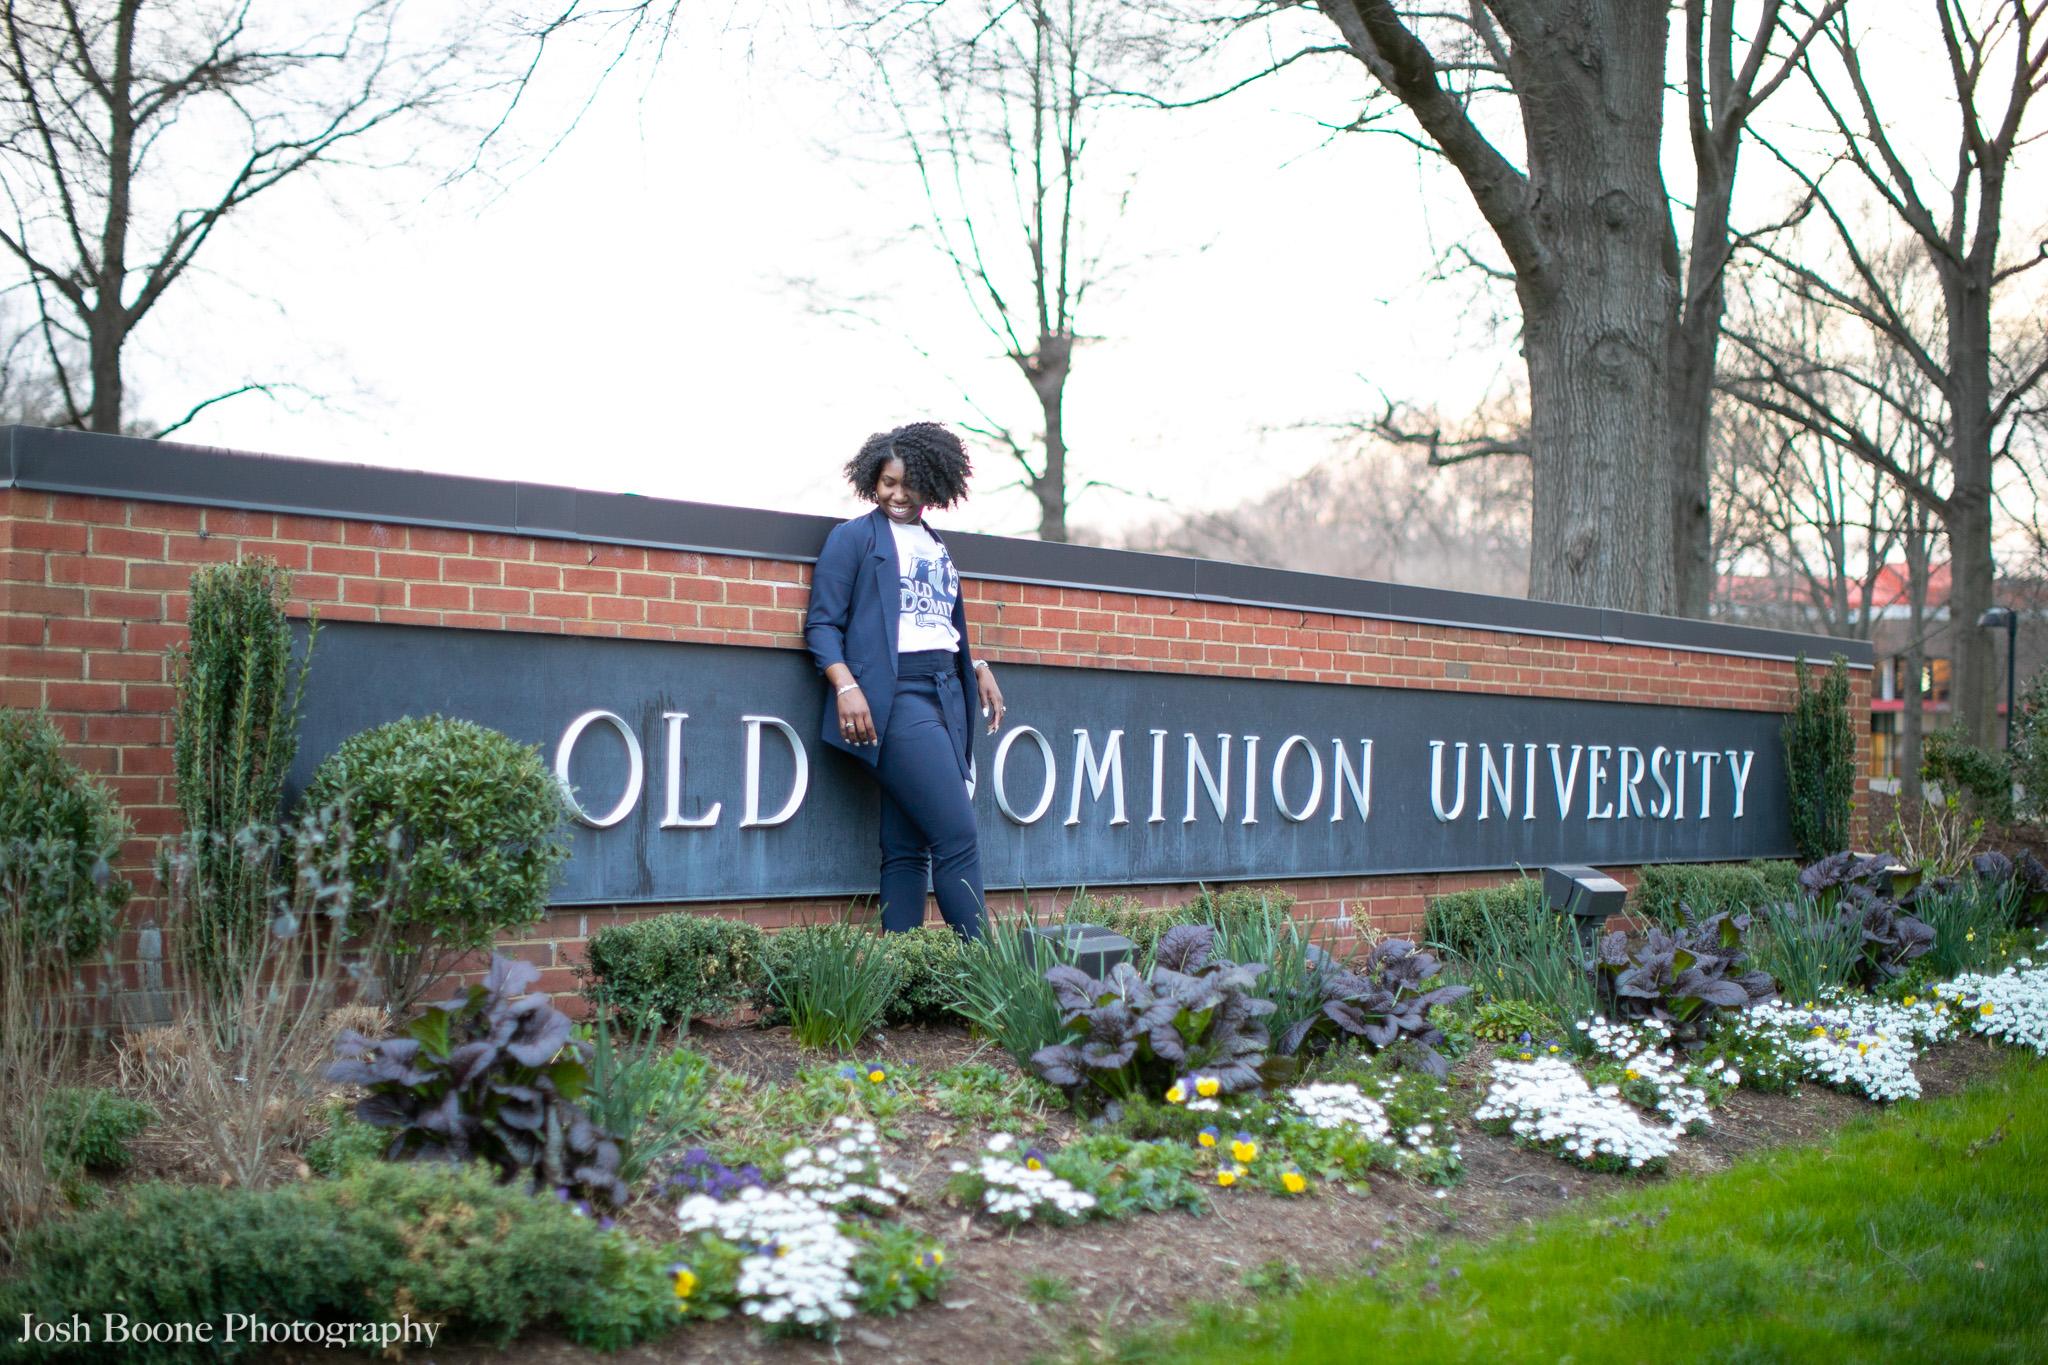 old_dominion_university_graduation_pictures-11.jpg